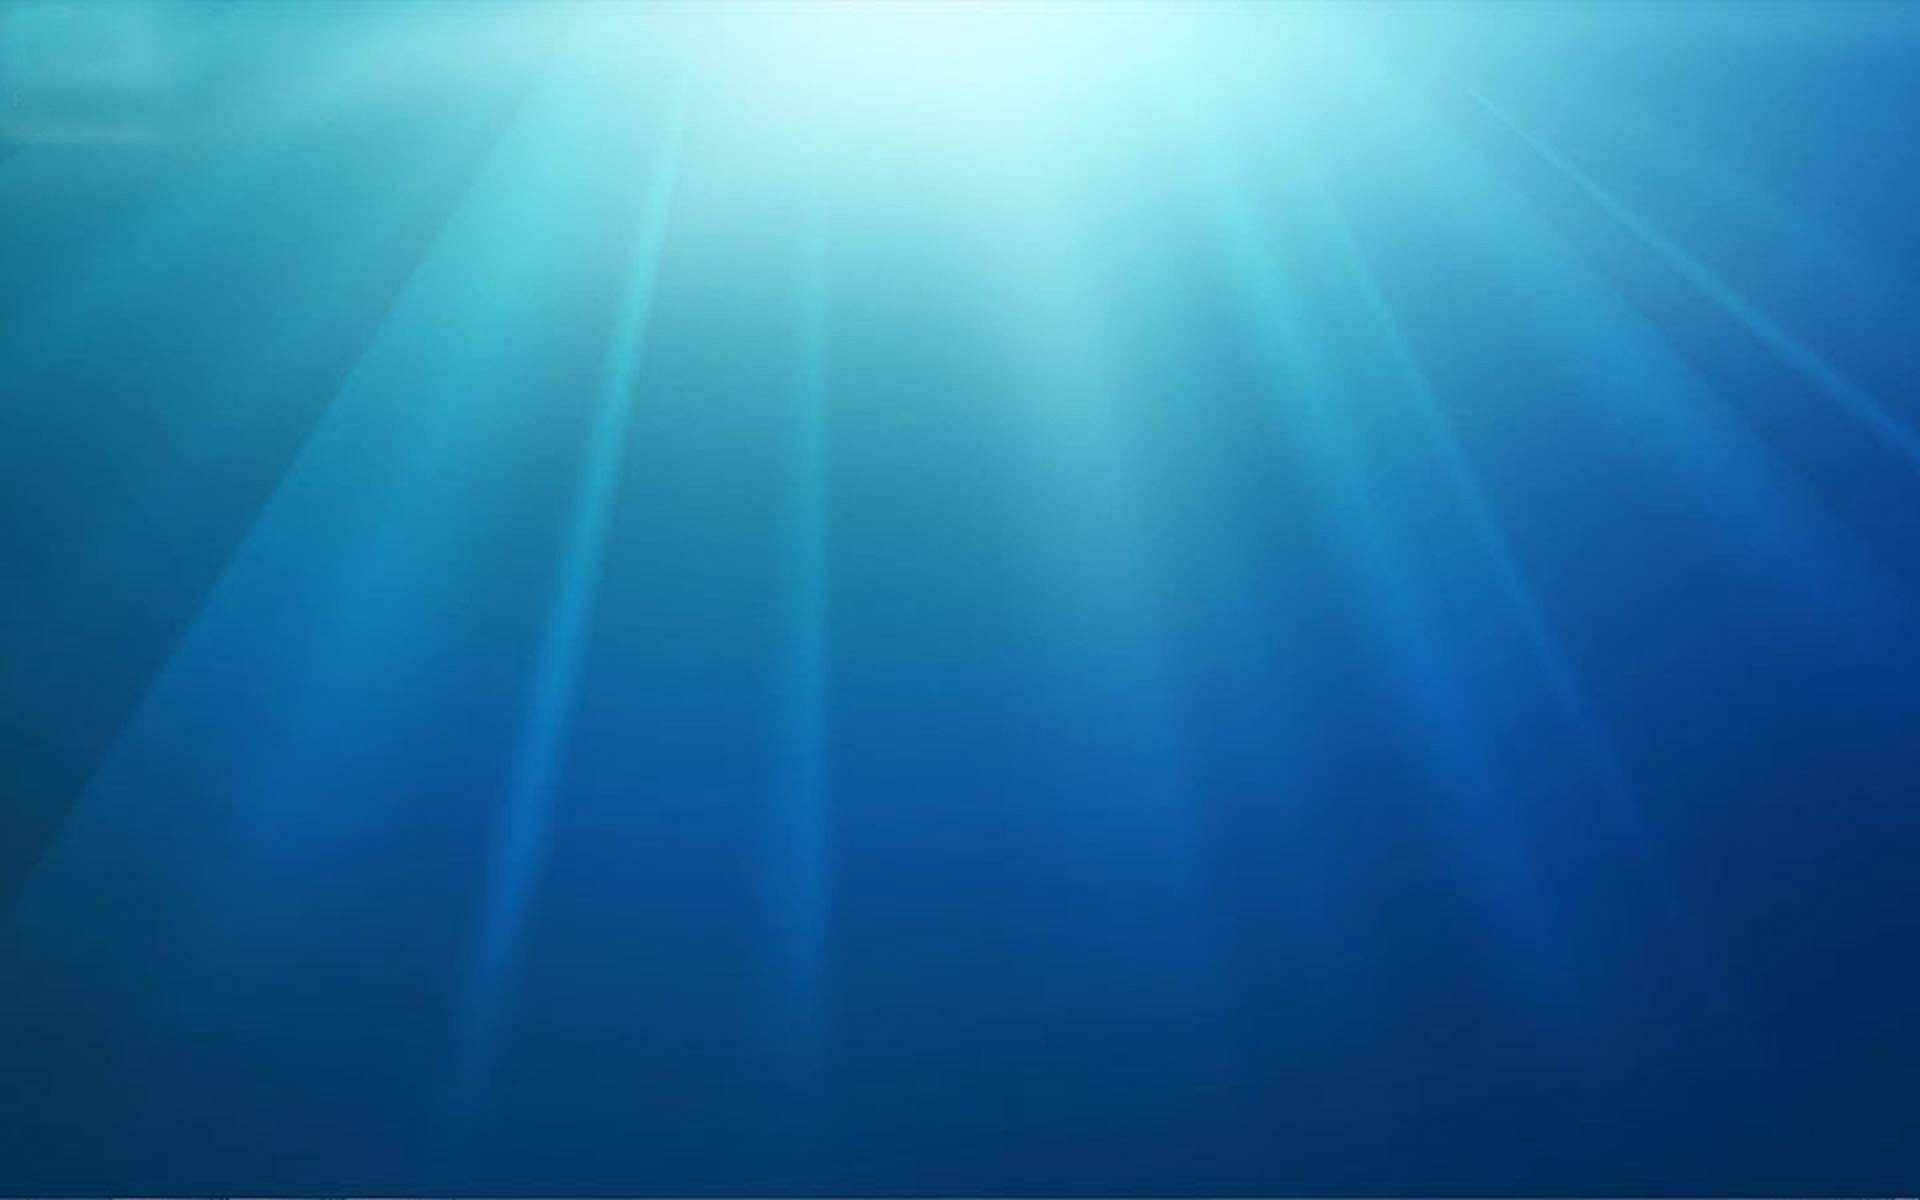 cartoon underwater scene Google Search Blue wallpapers